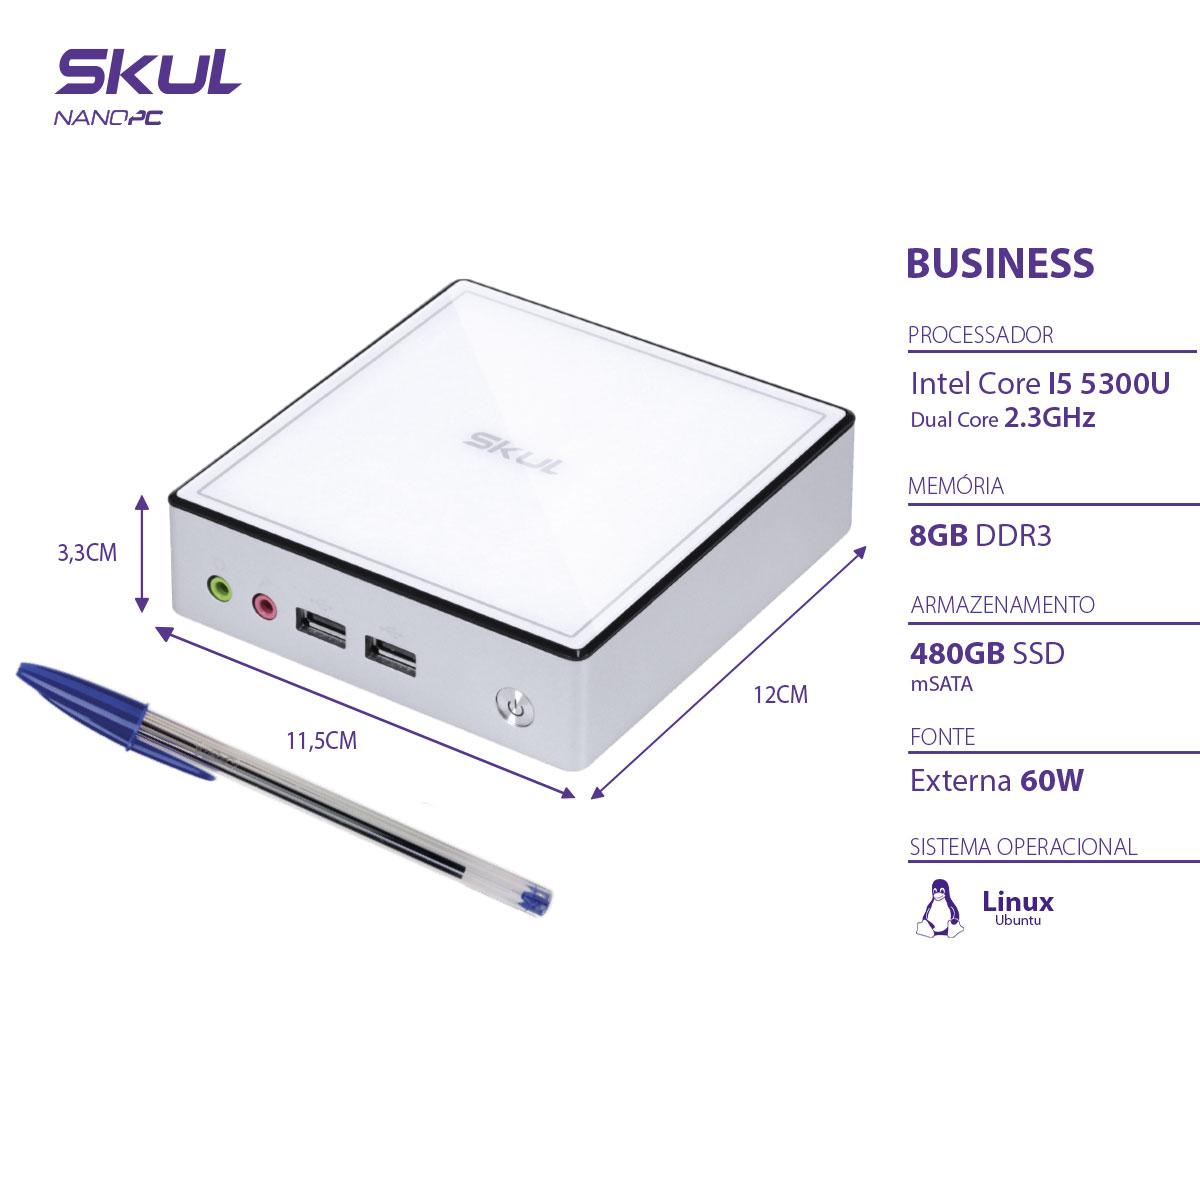 NANO COMPUTADOR BUSINESS B500 - I5 5300U 2.3GHZ MEM 8GB DDR3 SODIMM SSD 480GB WI-FI FONTE EXTERNA LINUX  - Audio Video & cia